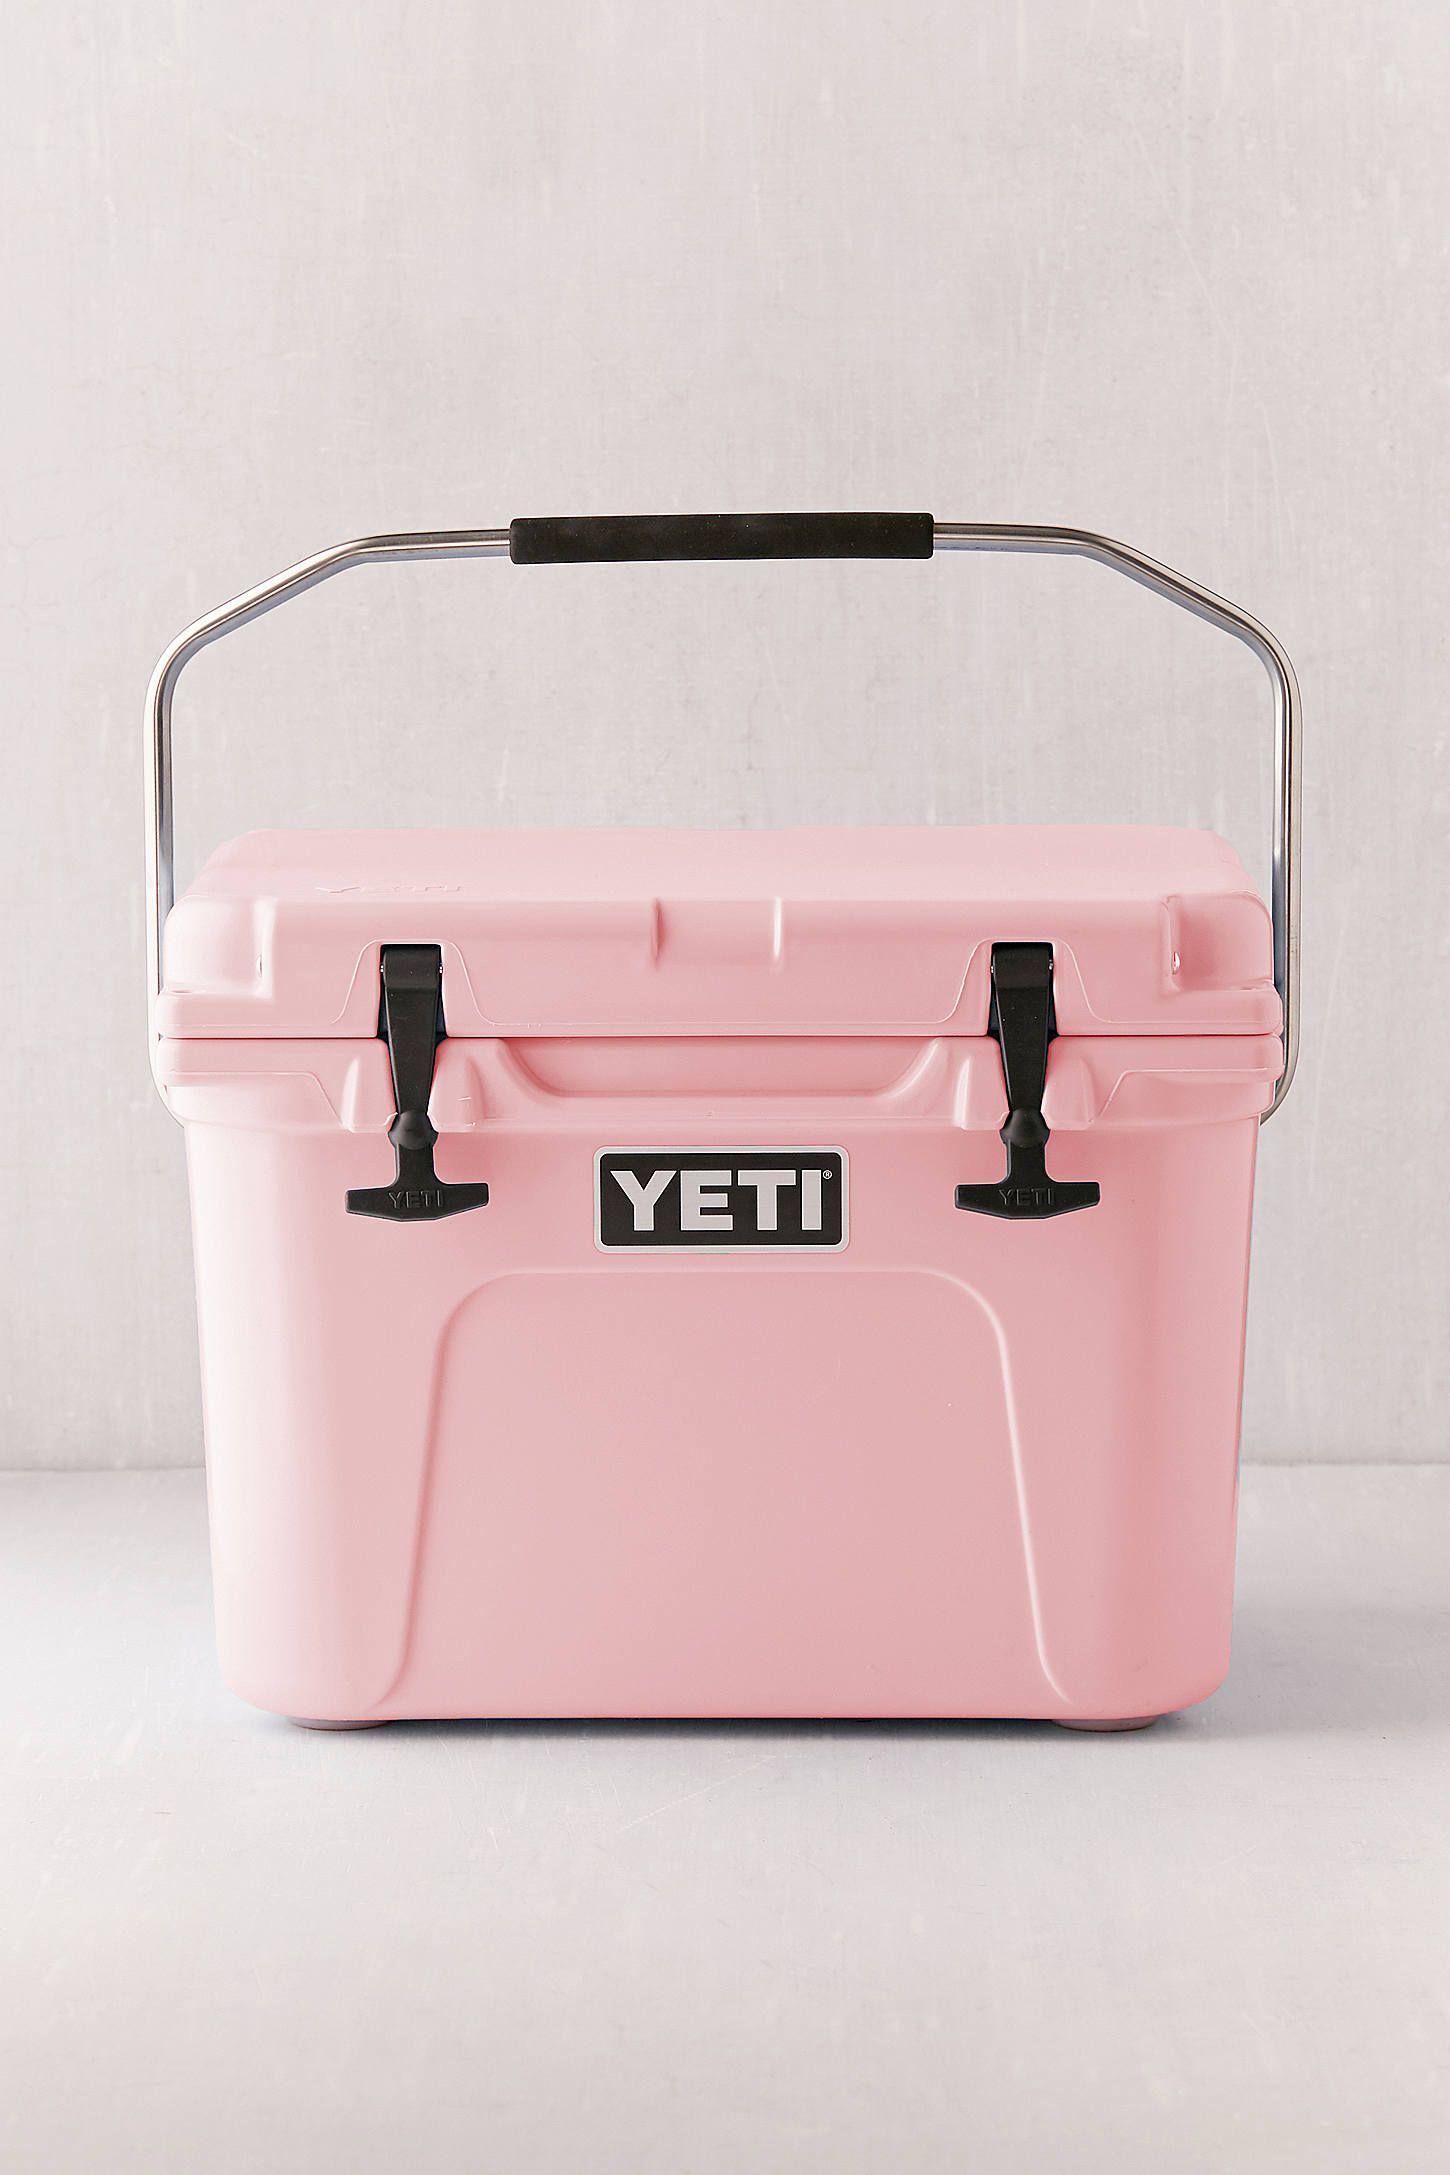 Yeti Limited Edition Pink Roadie Cooler Yeti Cooler Colors Yeti Pink Yeti